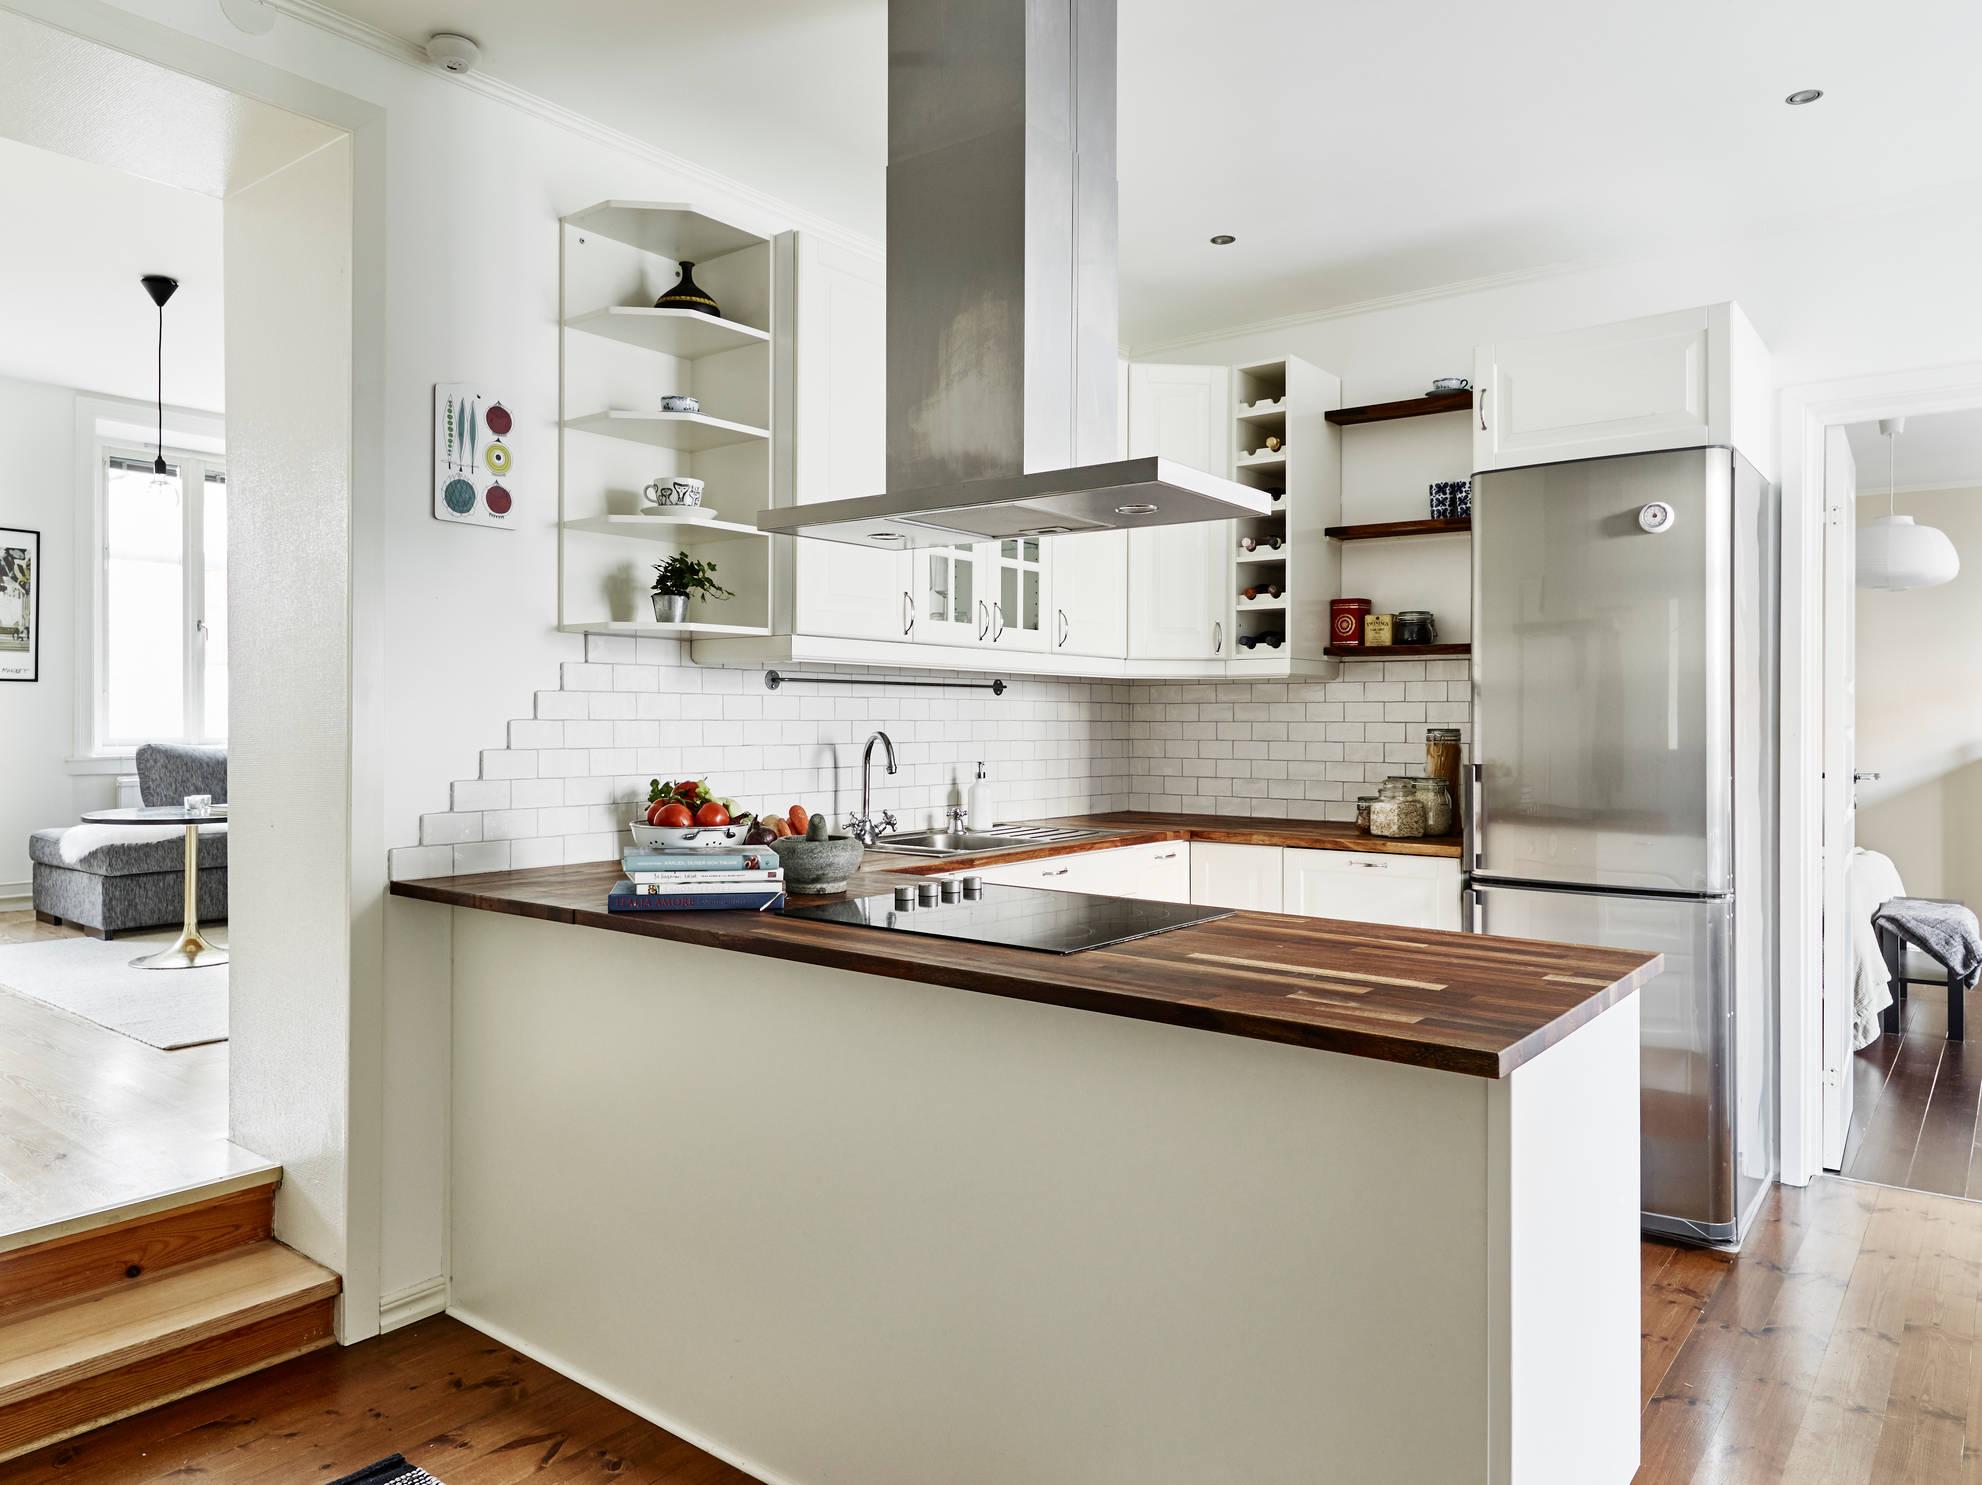 Pisos n rdicos peque os con gran amplitud blog tienda for Decoracion pisos pequenos modernos